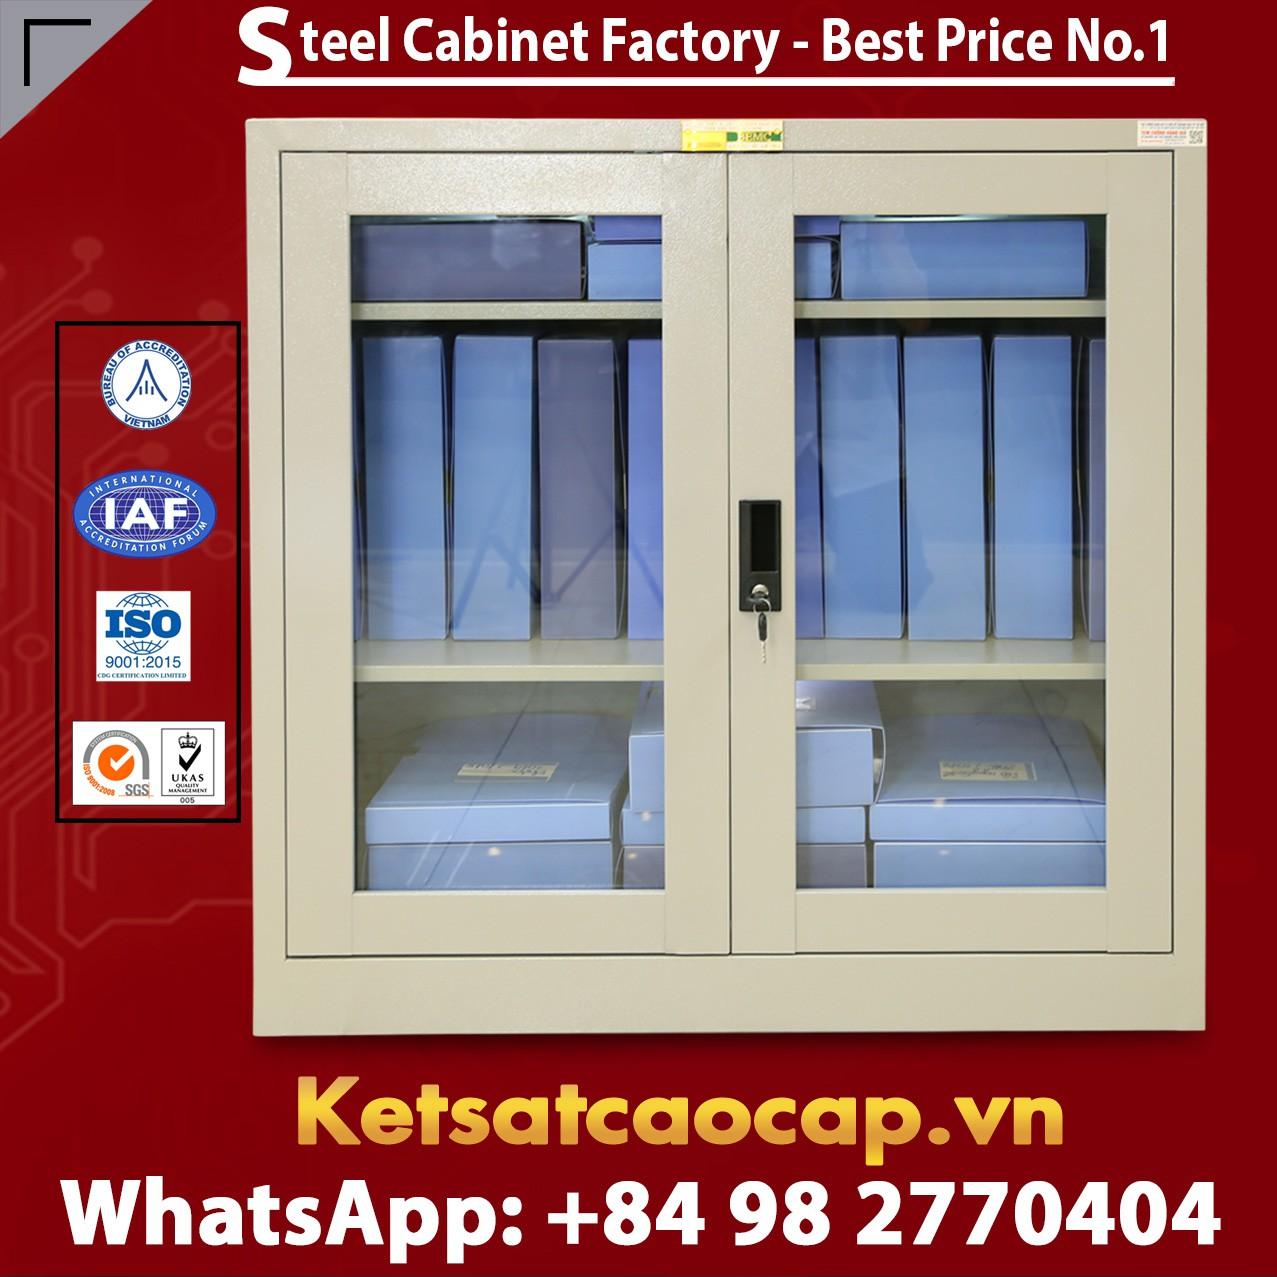 Glass Steel Cabinet TU09CK900